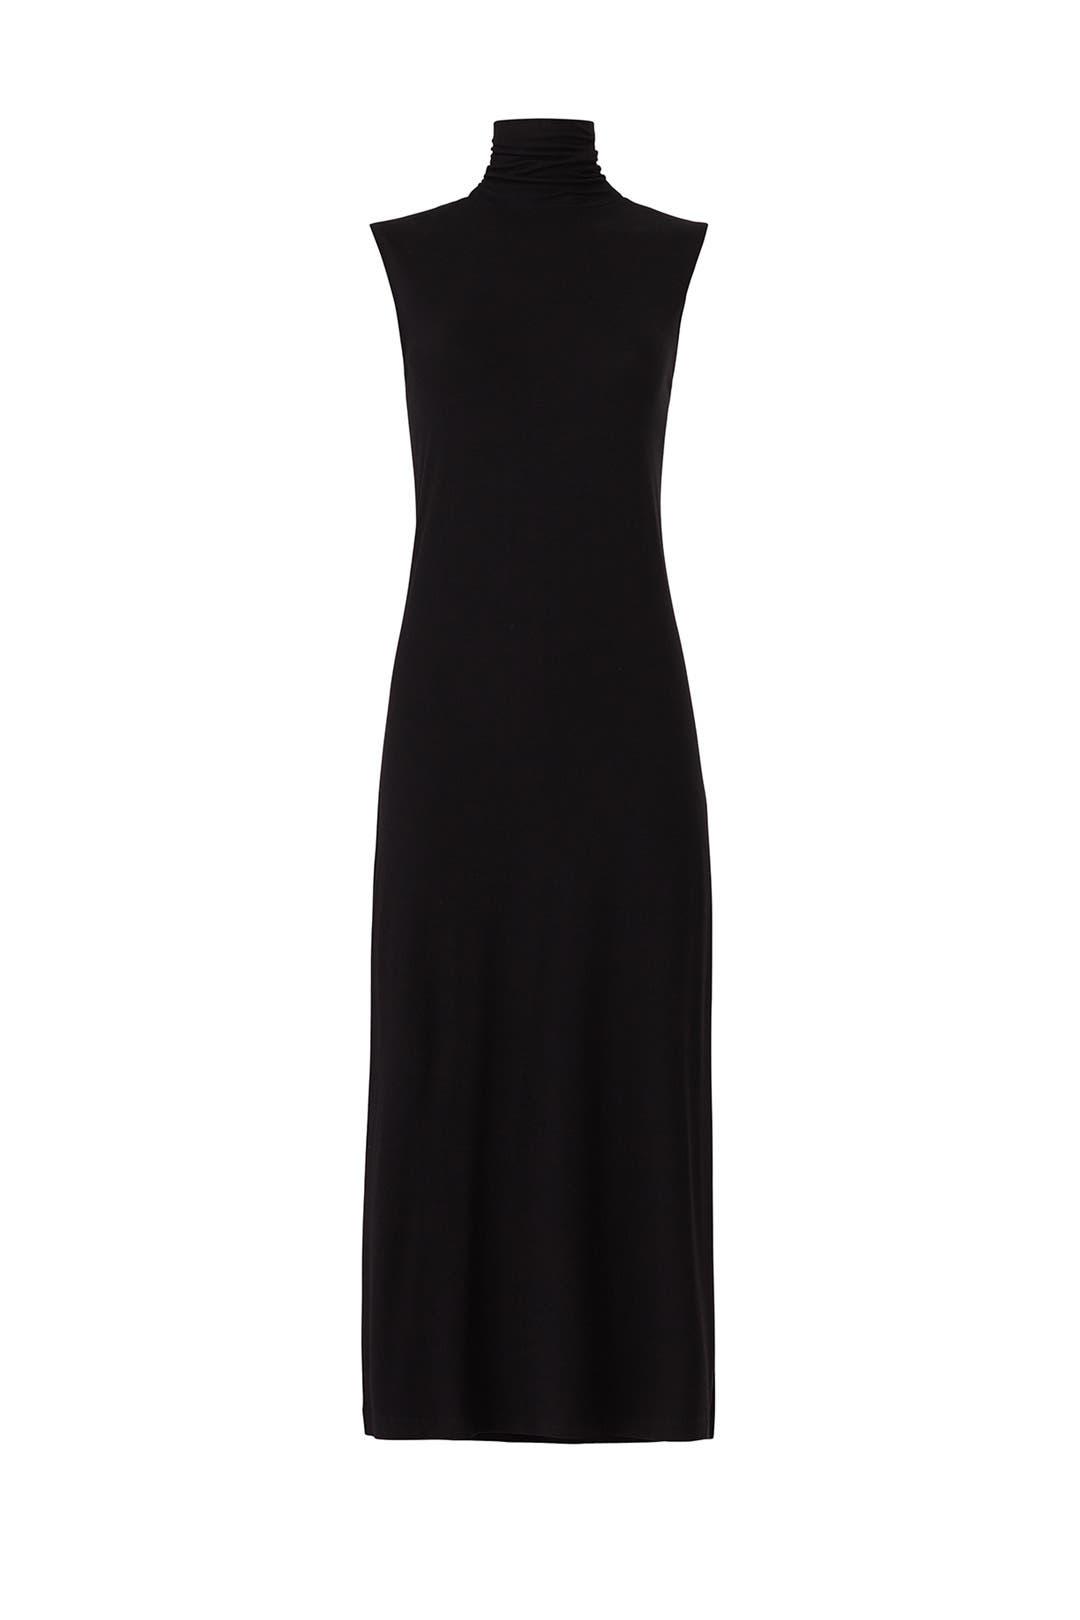 58c0254006 VINCE. Read Reviews. Sleeveless Turtleneck Dress